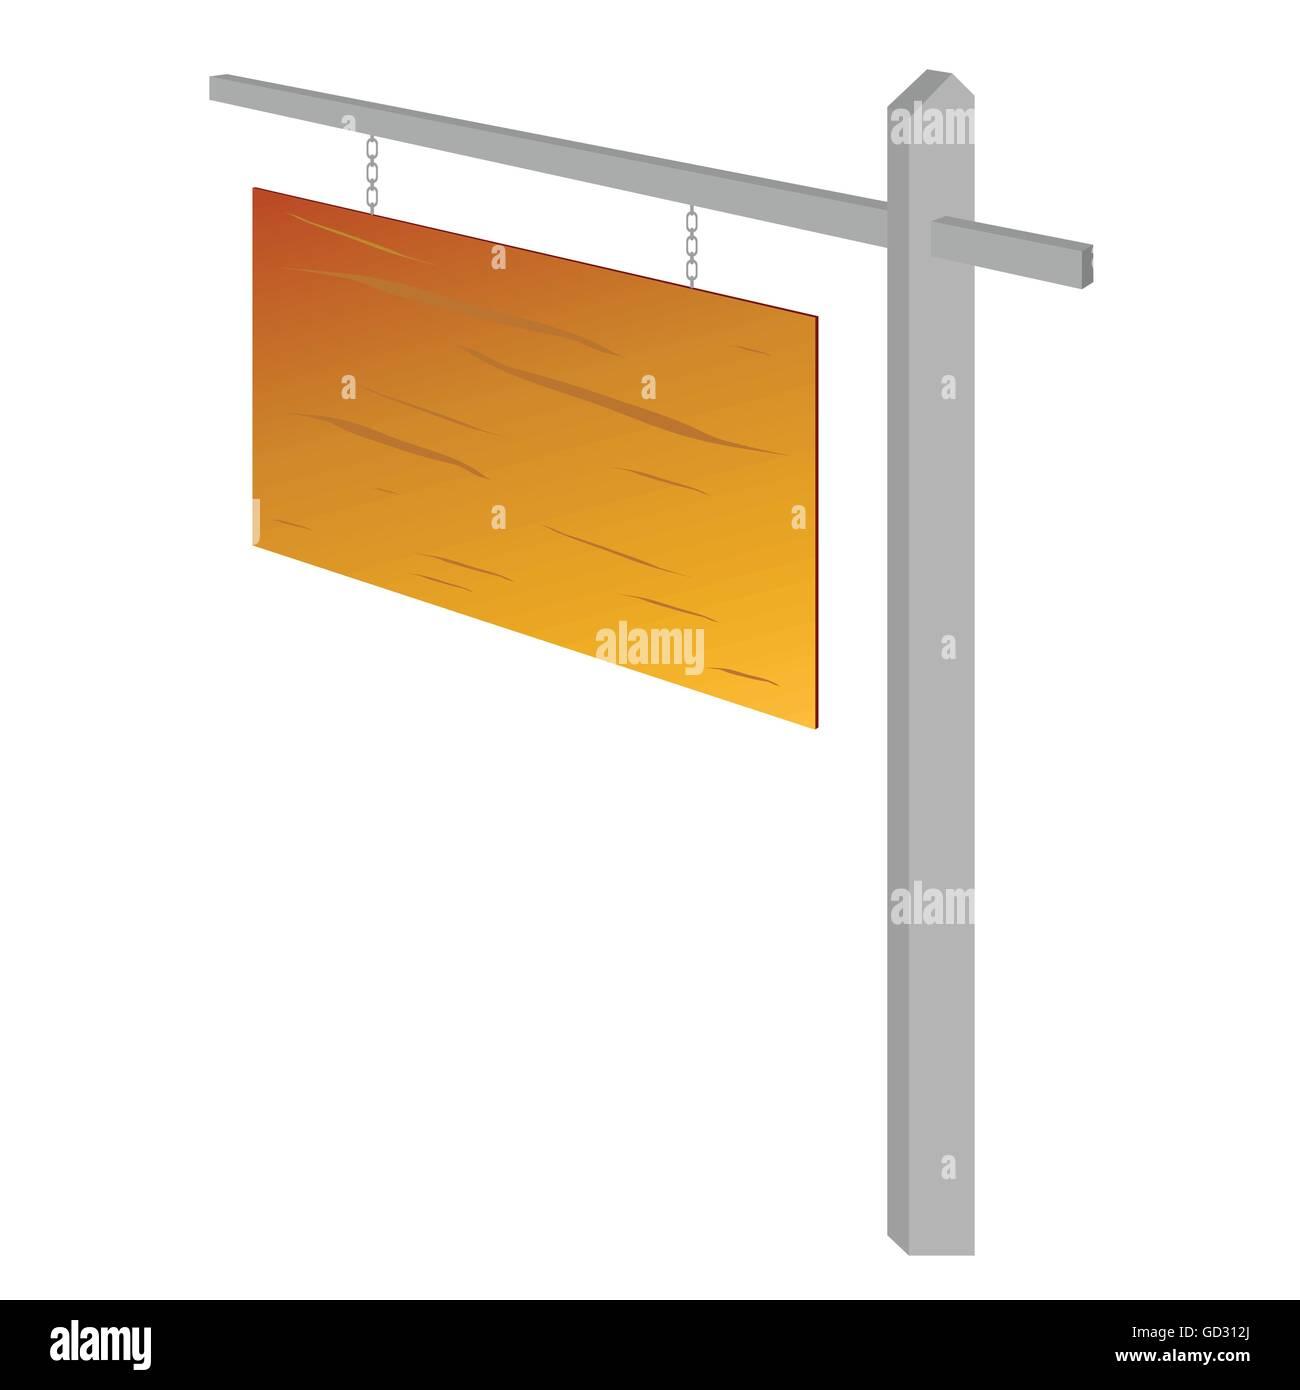 wooden sign vector illustration on white background - Stock Vector